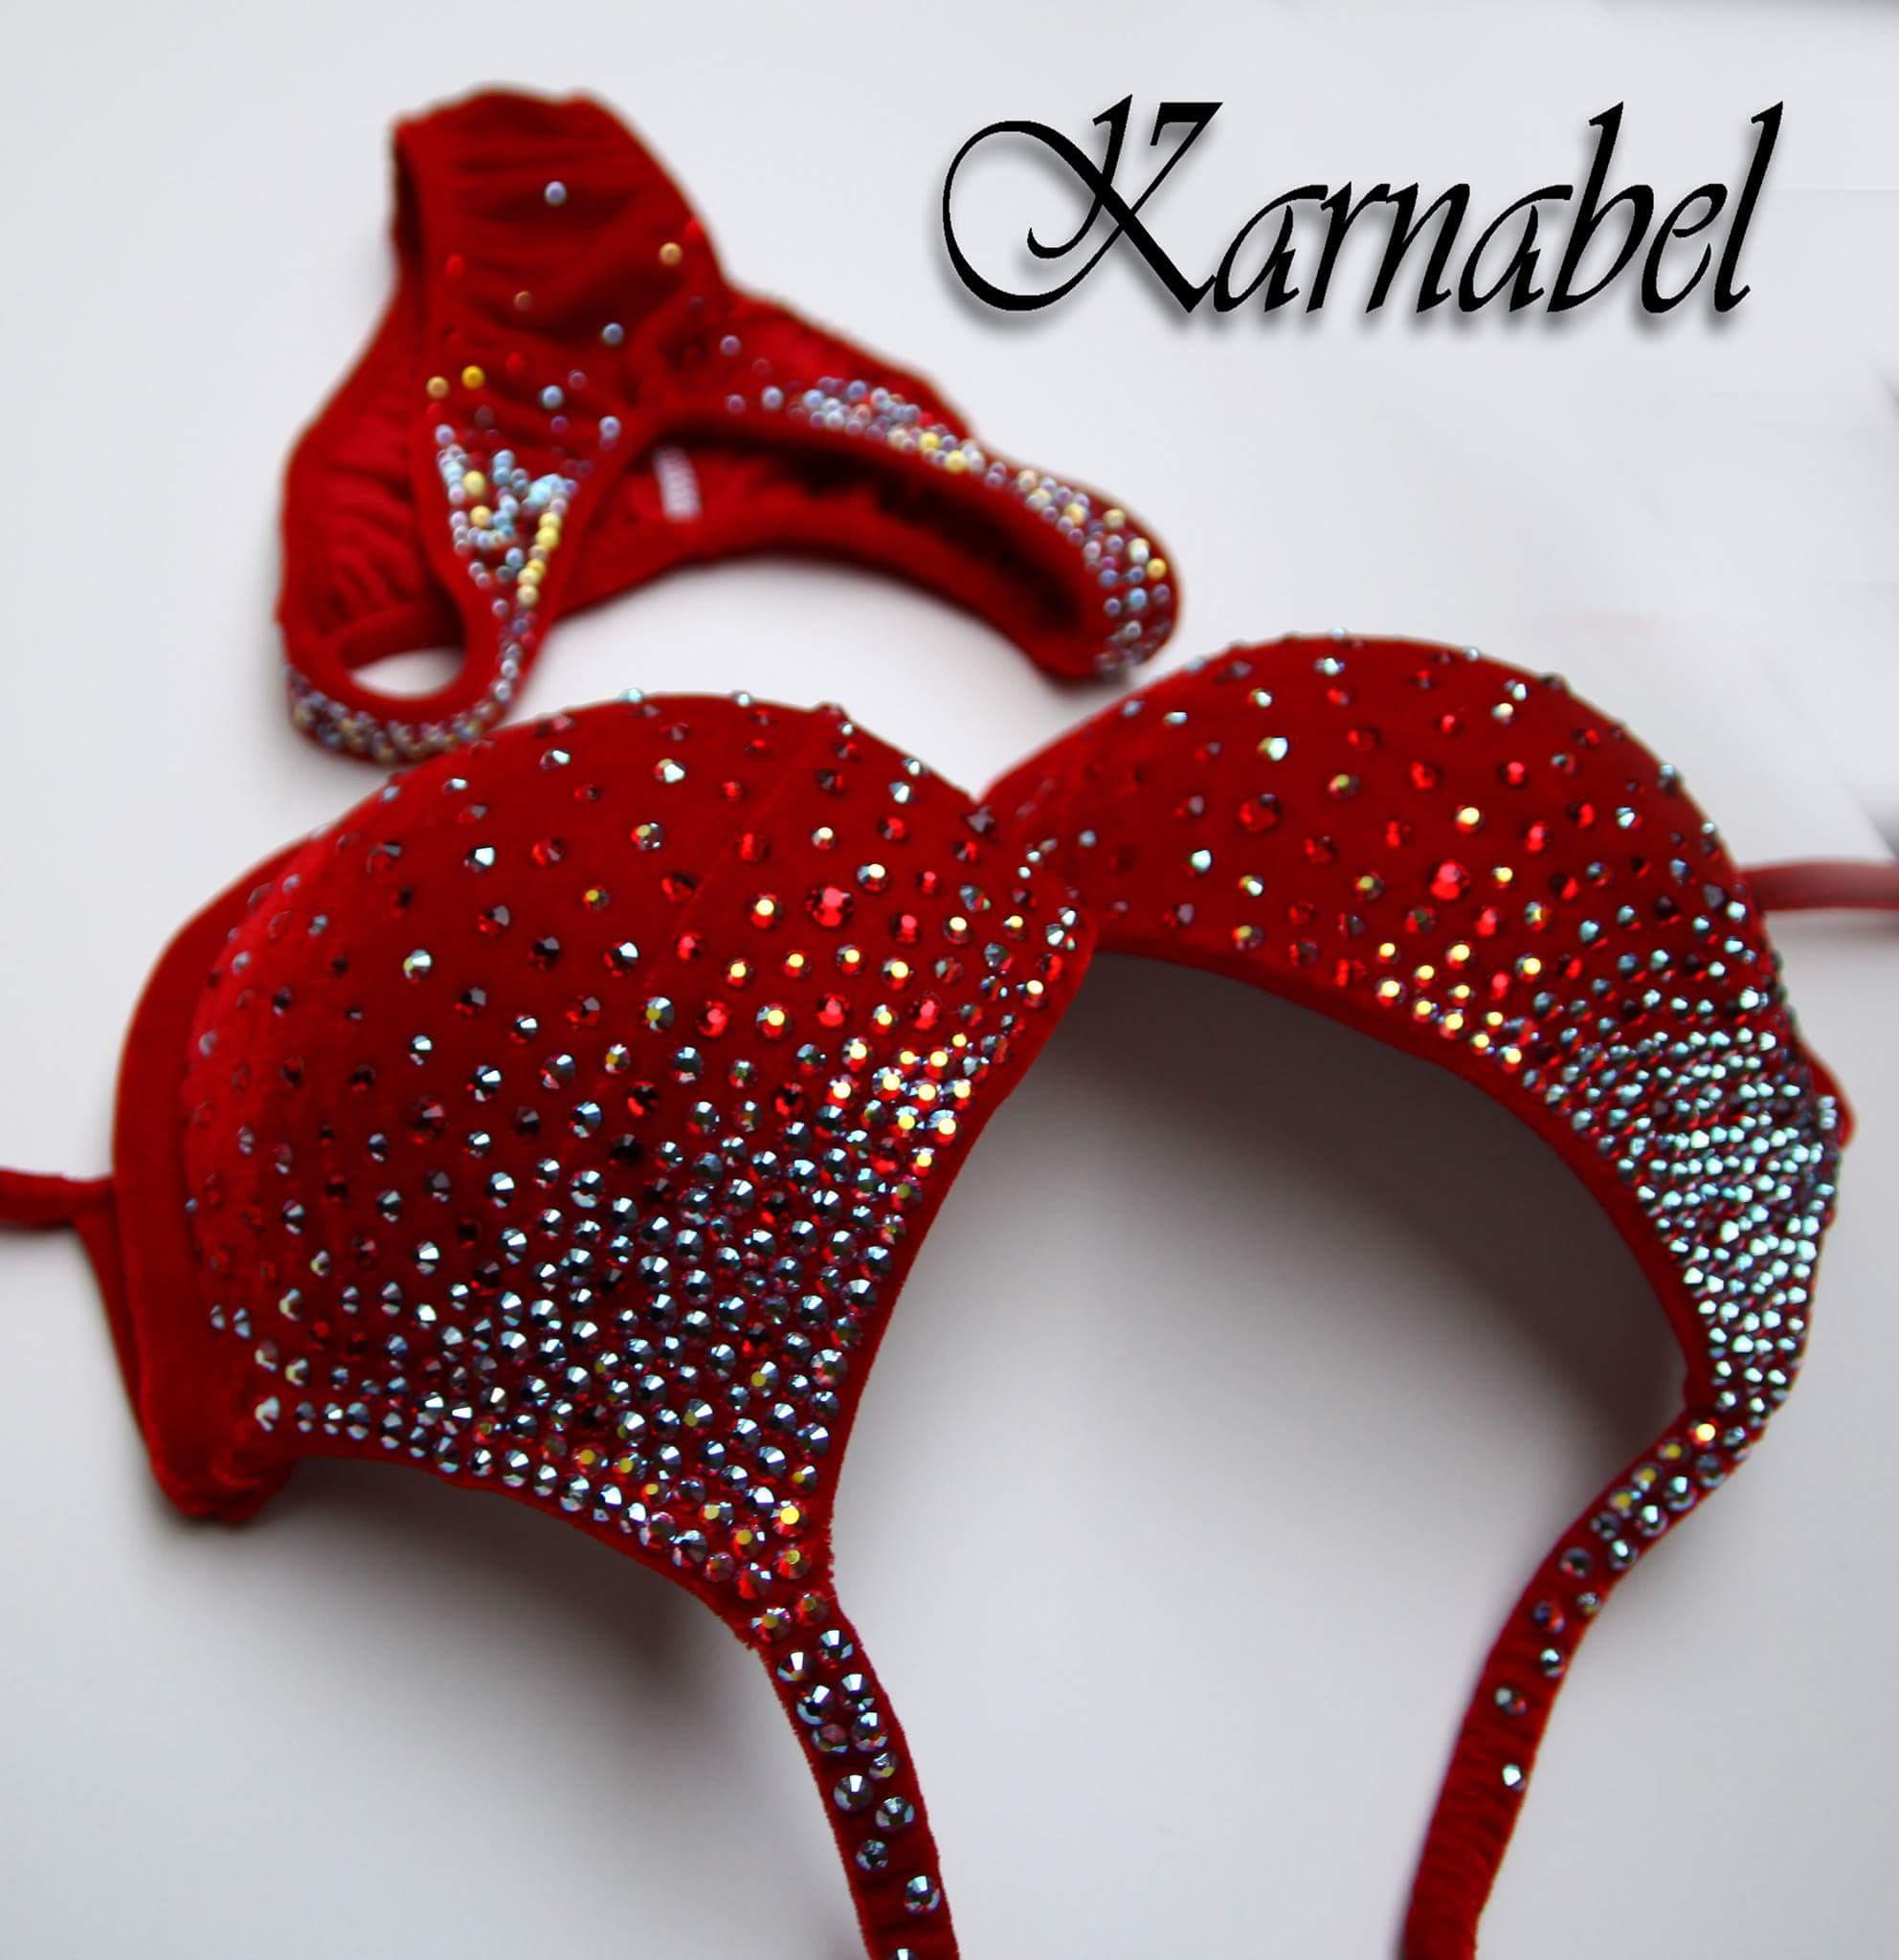 Plavky - Karnabel